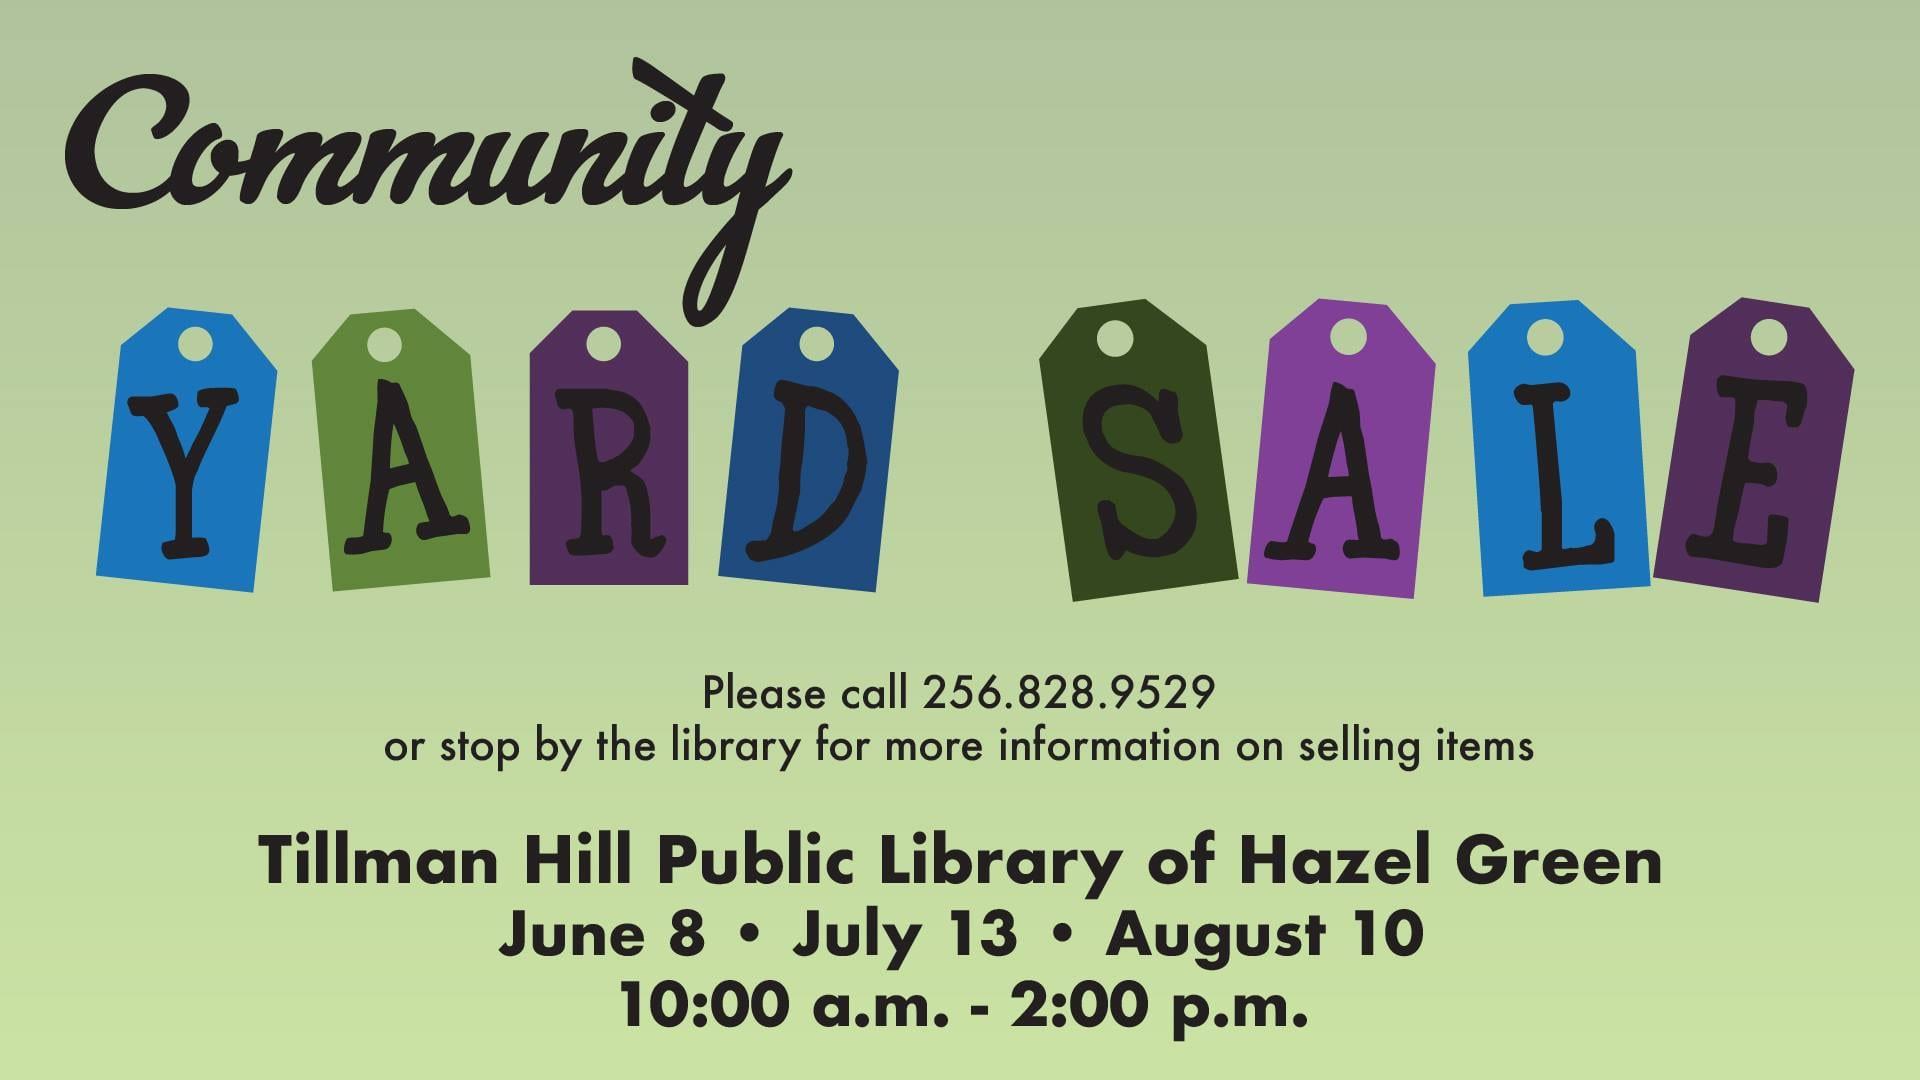 Community Yard Sale at Tillman Hill Public Library | Rocket